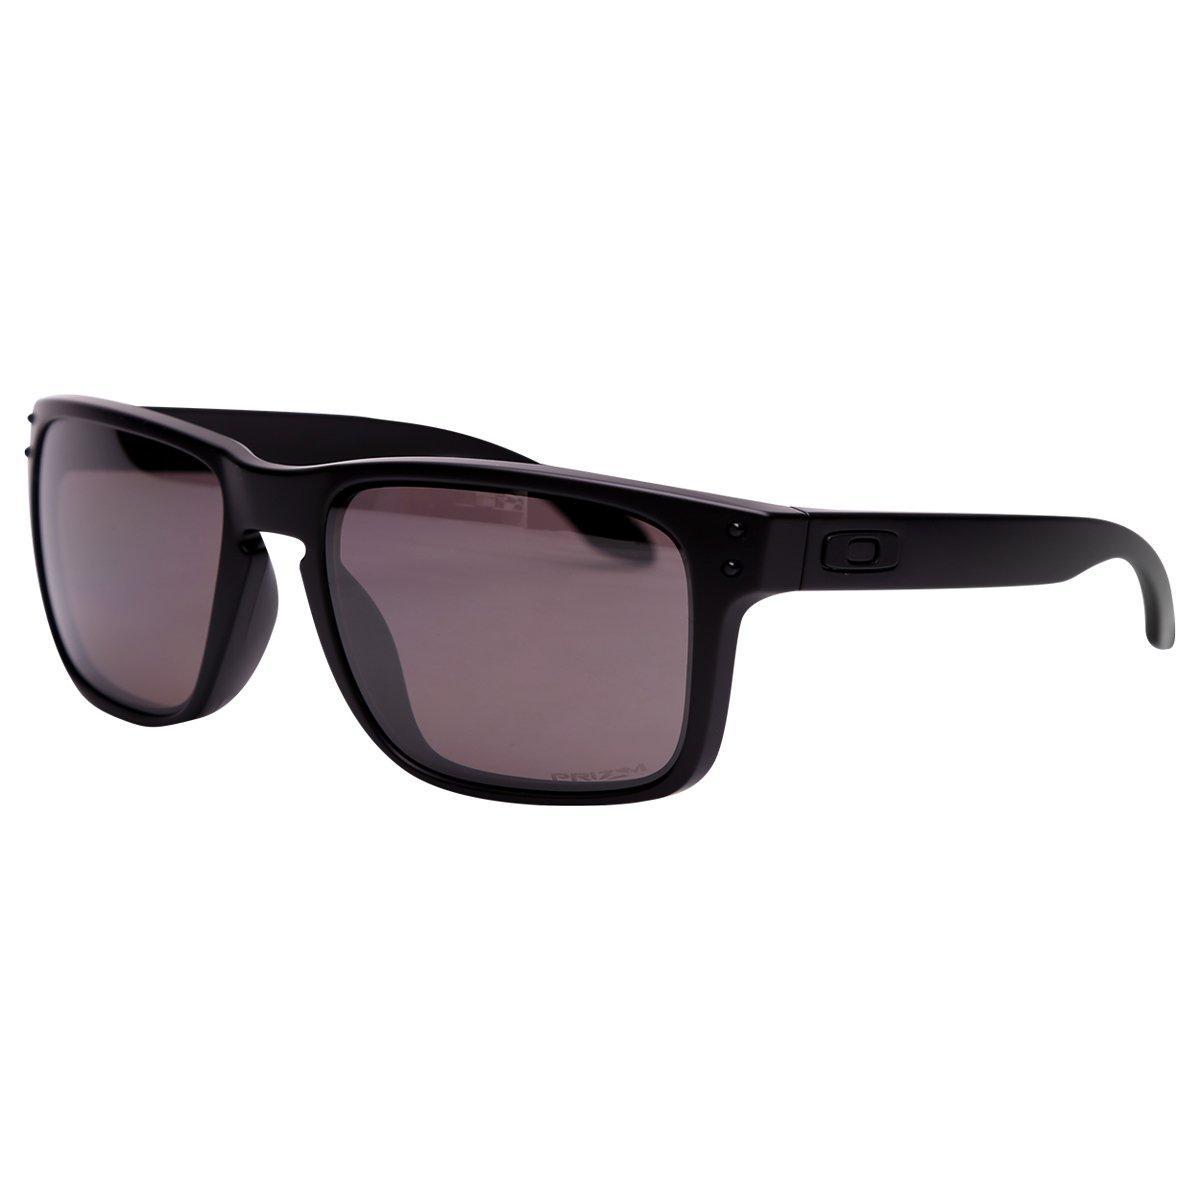 Óculos Oakley Holbrook Covert - Prizm Daily Polarizado - Compre ... 0c1d6feffe